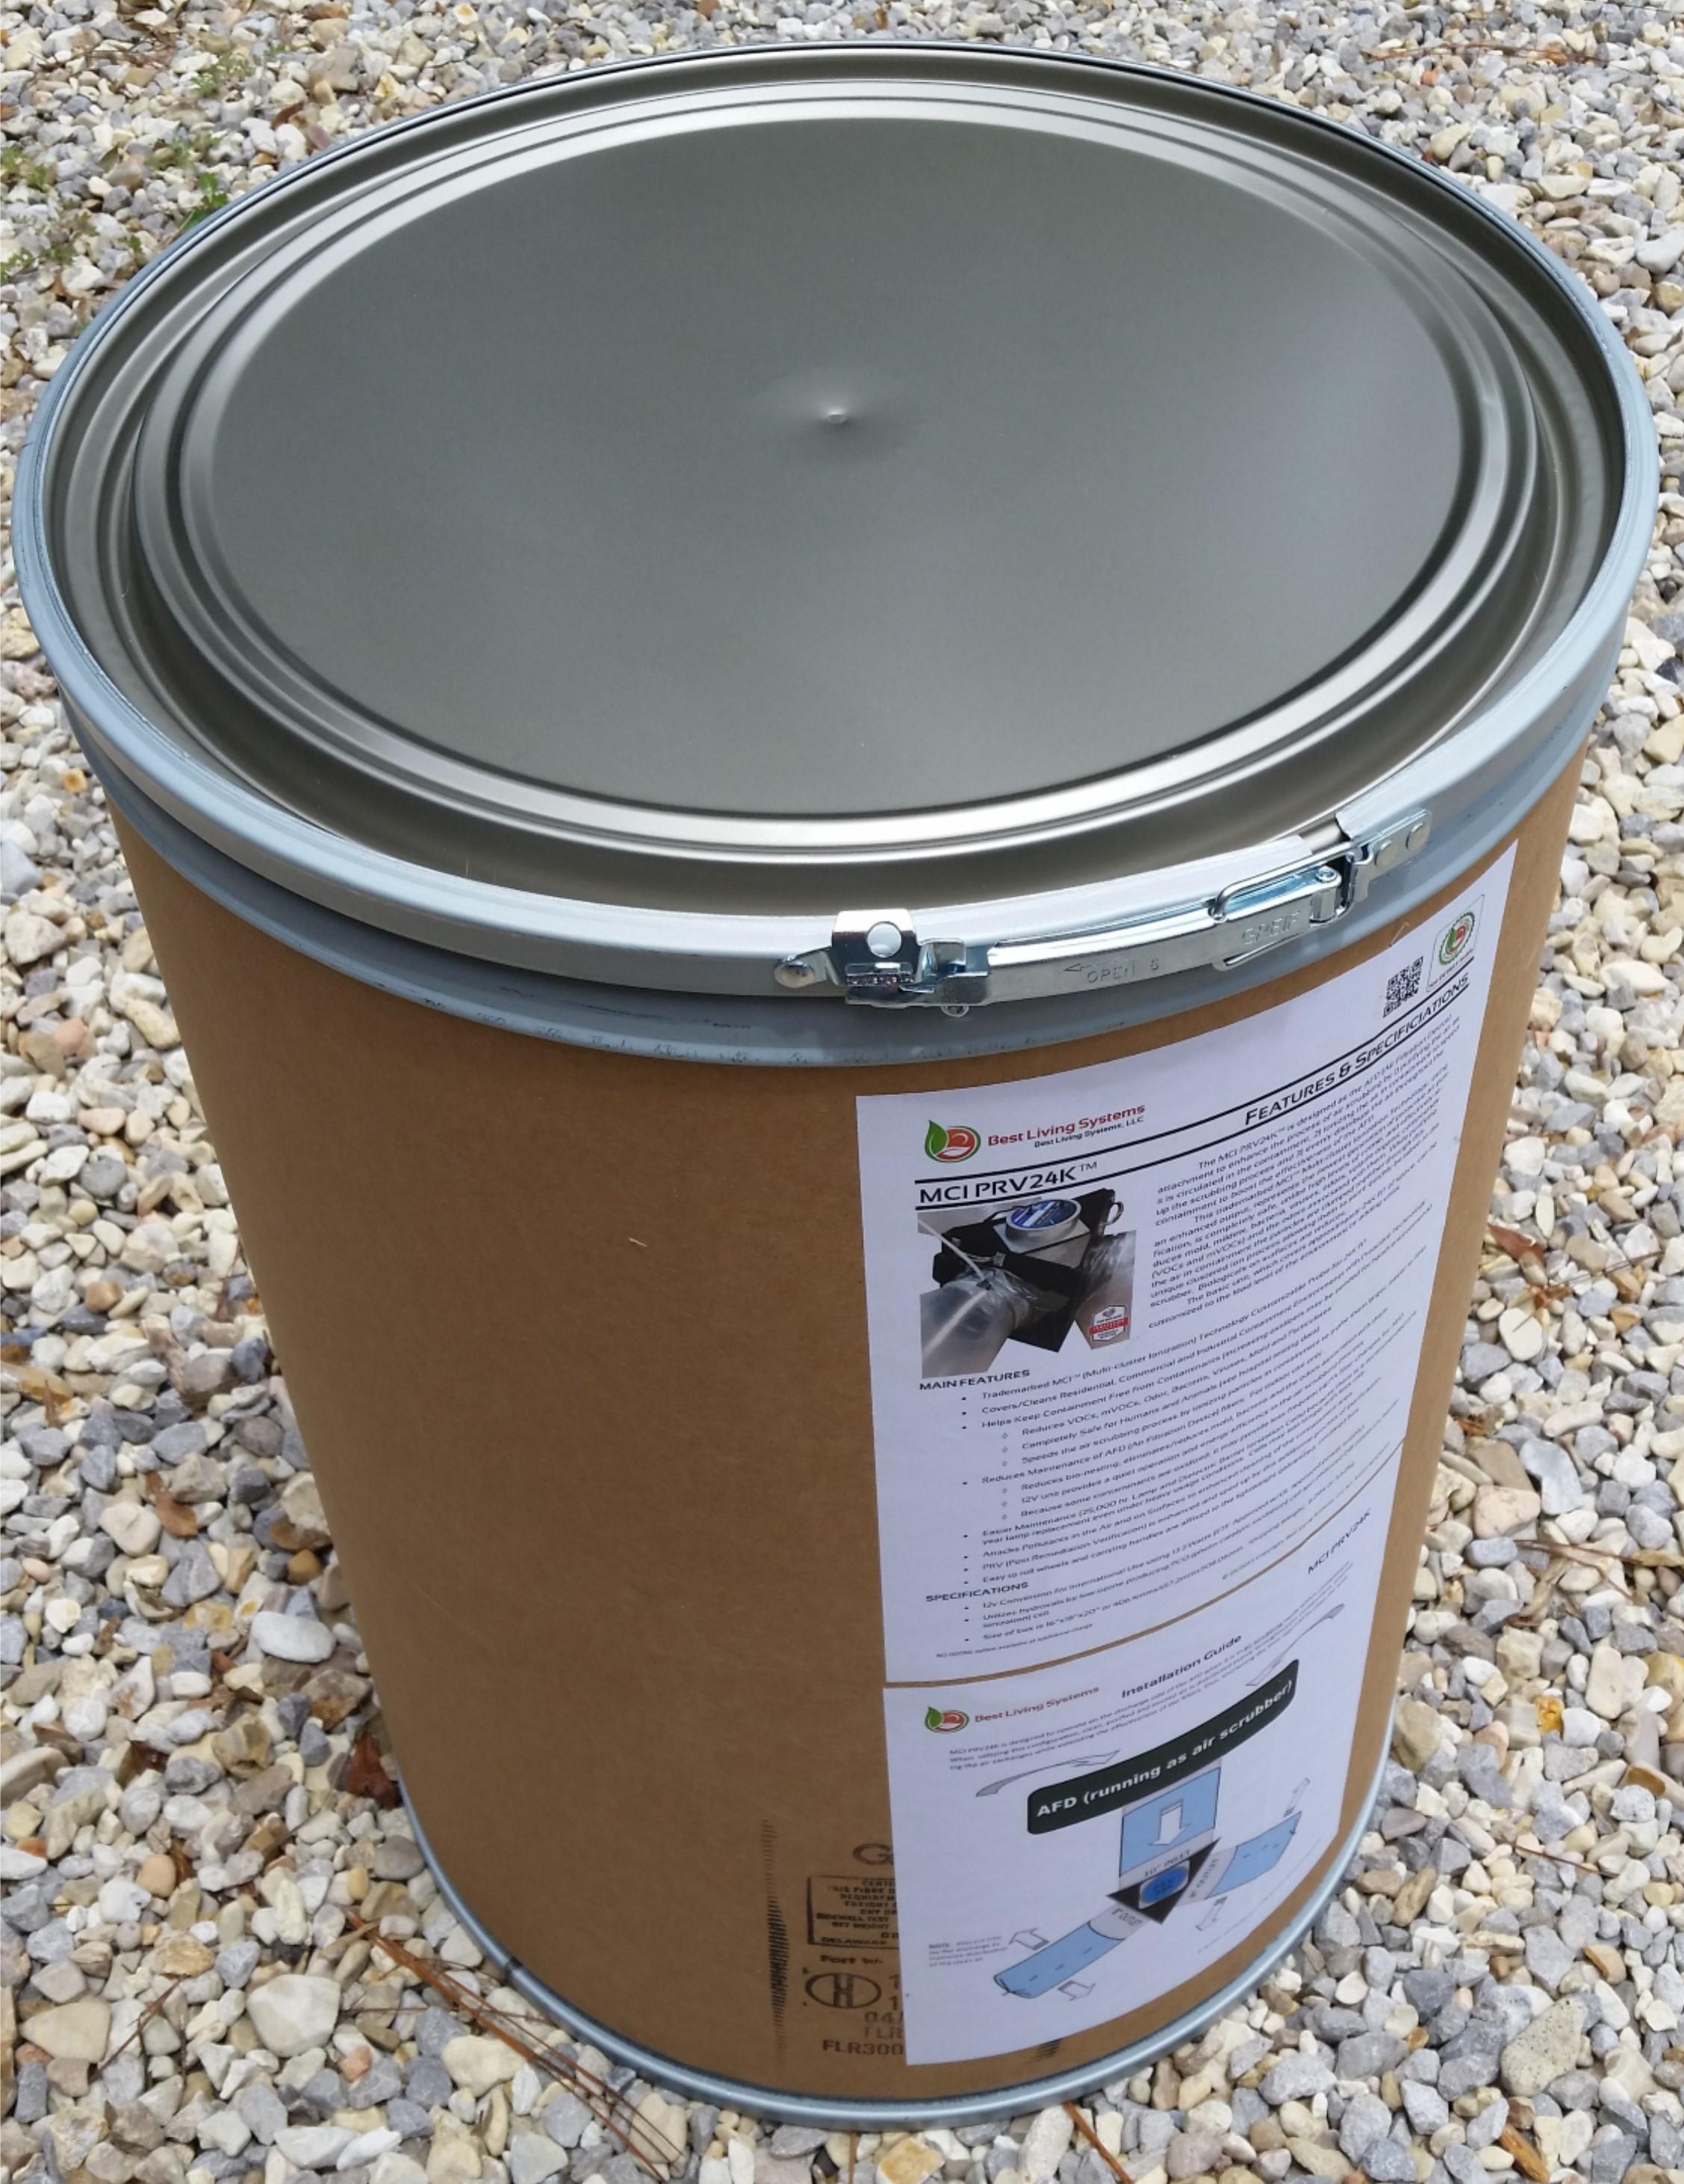 MCI PRV24K Storage Drum (reusable)